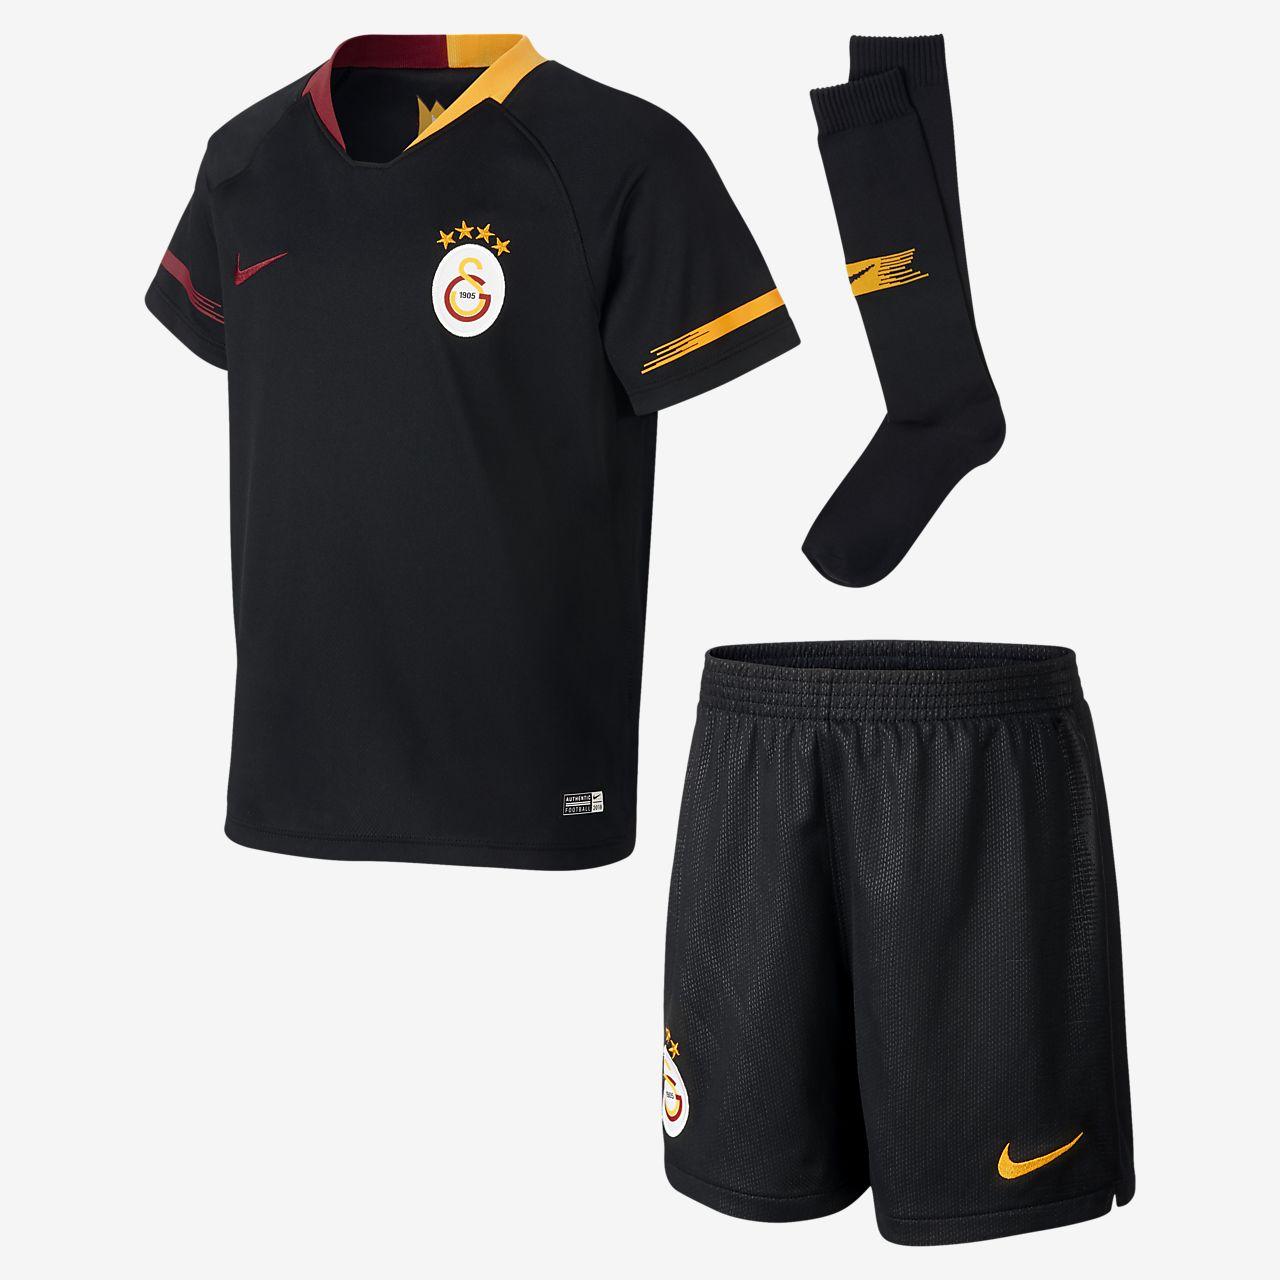 2018/19 Galatasaray S.K. Stadium Away-fodboldsæt til små børn